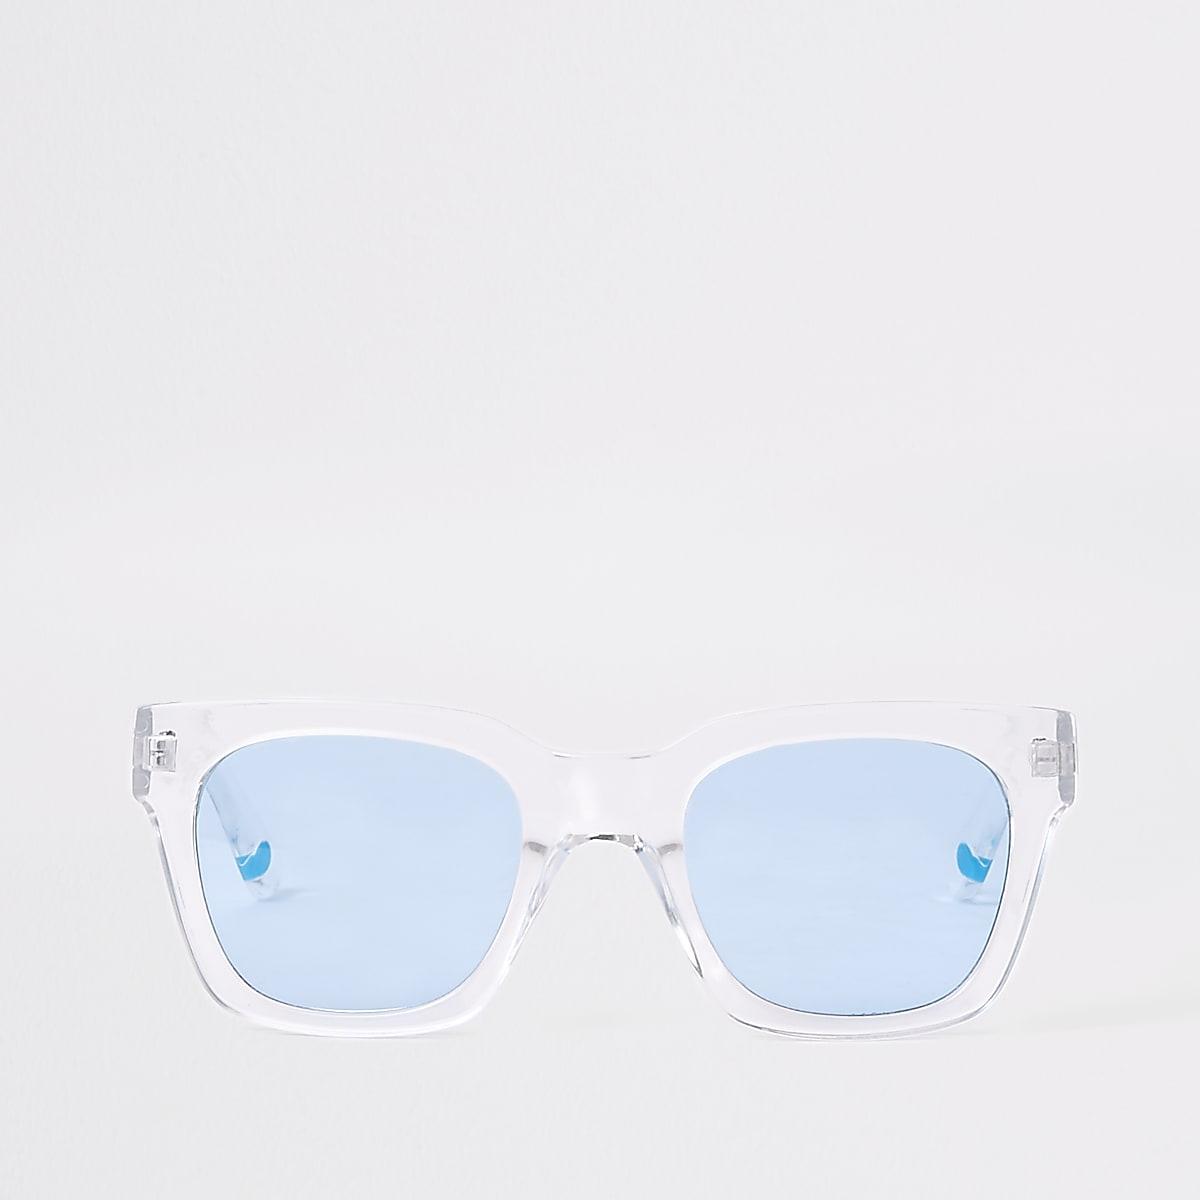 ebef0f5d9aff Aviator Goggle Sungles For Men Blue Lens Hi Tek Model 2525. White Clear  Frame Blue Lens Sungles Retro Men. White Clear Frame Blue Lens Sungles Retro